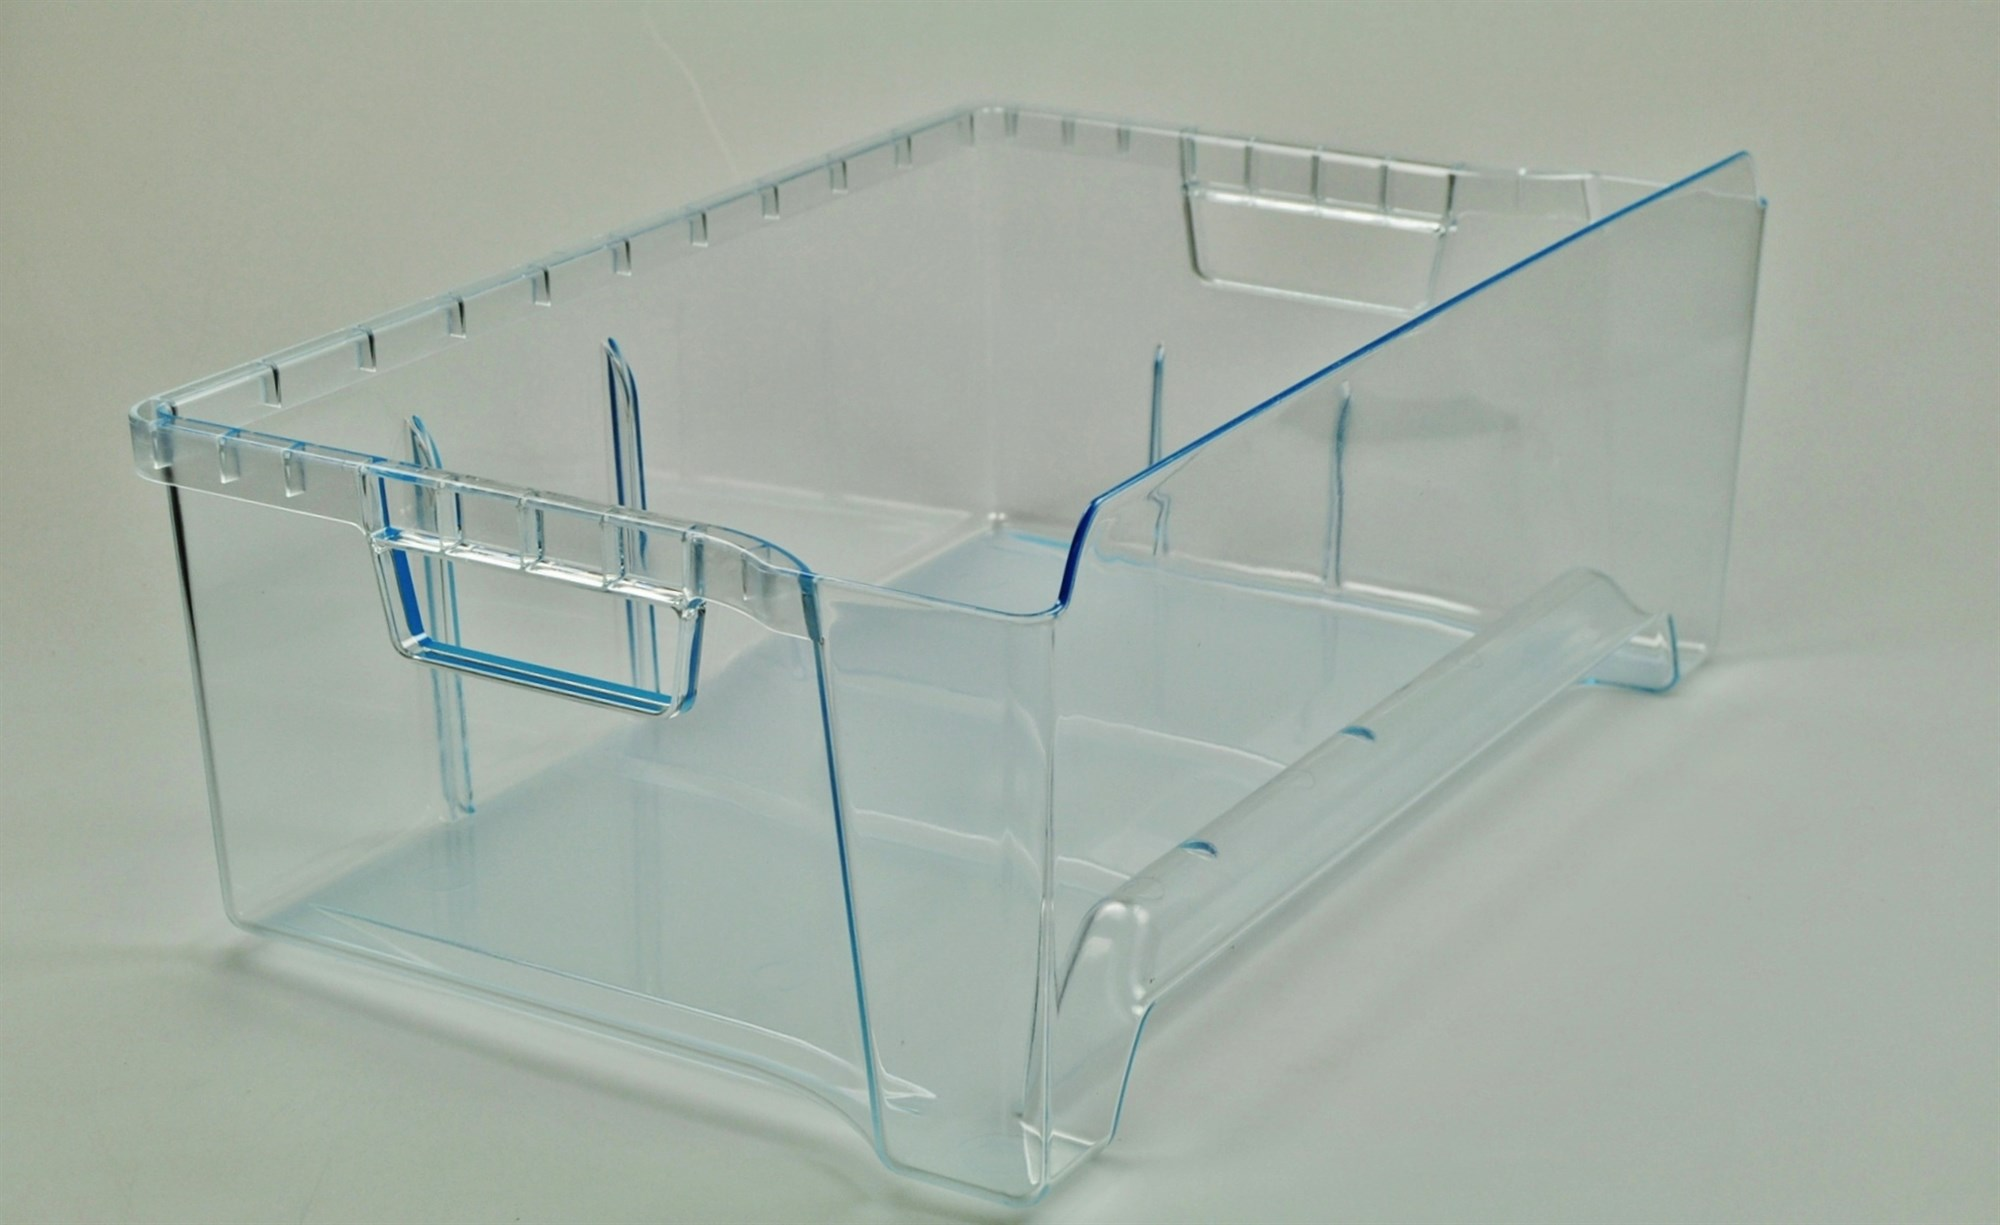 bac l gume husqvarna frigo cong lateur 196mm x 470mm x 317mm. Black Bedroom Furniture Sets. Home Design Ideas